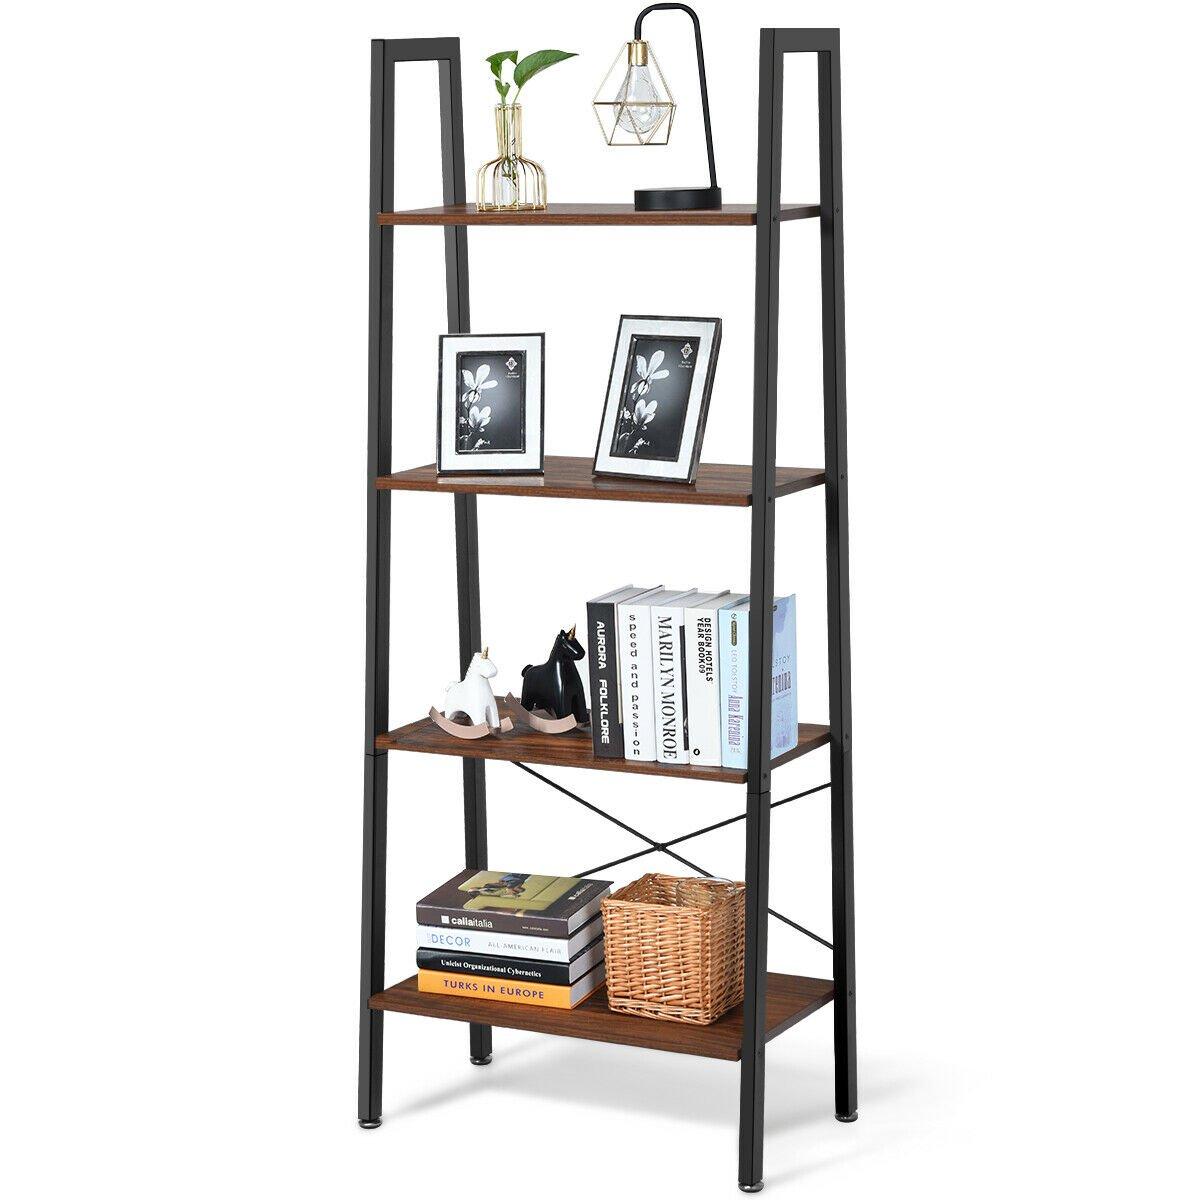 Gymax 4 Tier Ladder Shelf Ladder Bookcase Bookshelf Display Rack Plant Stand Wood